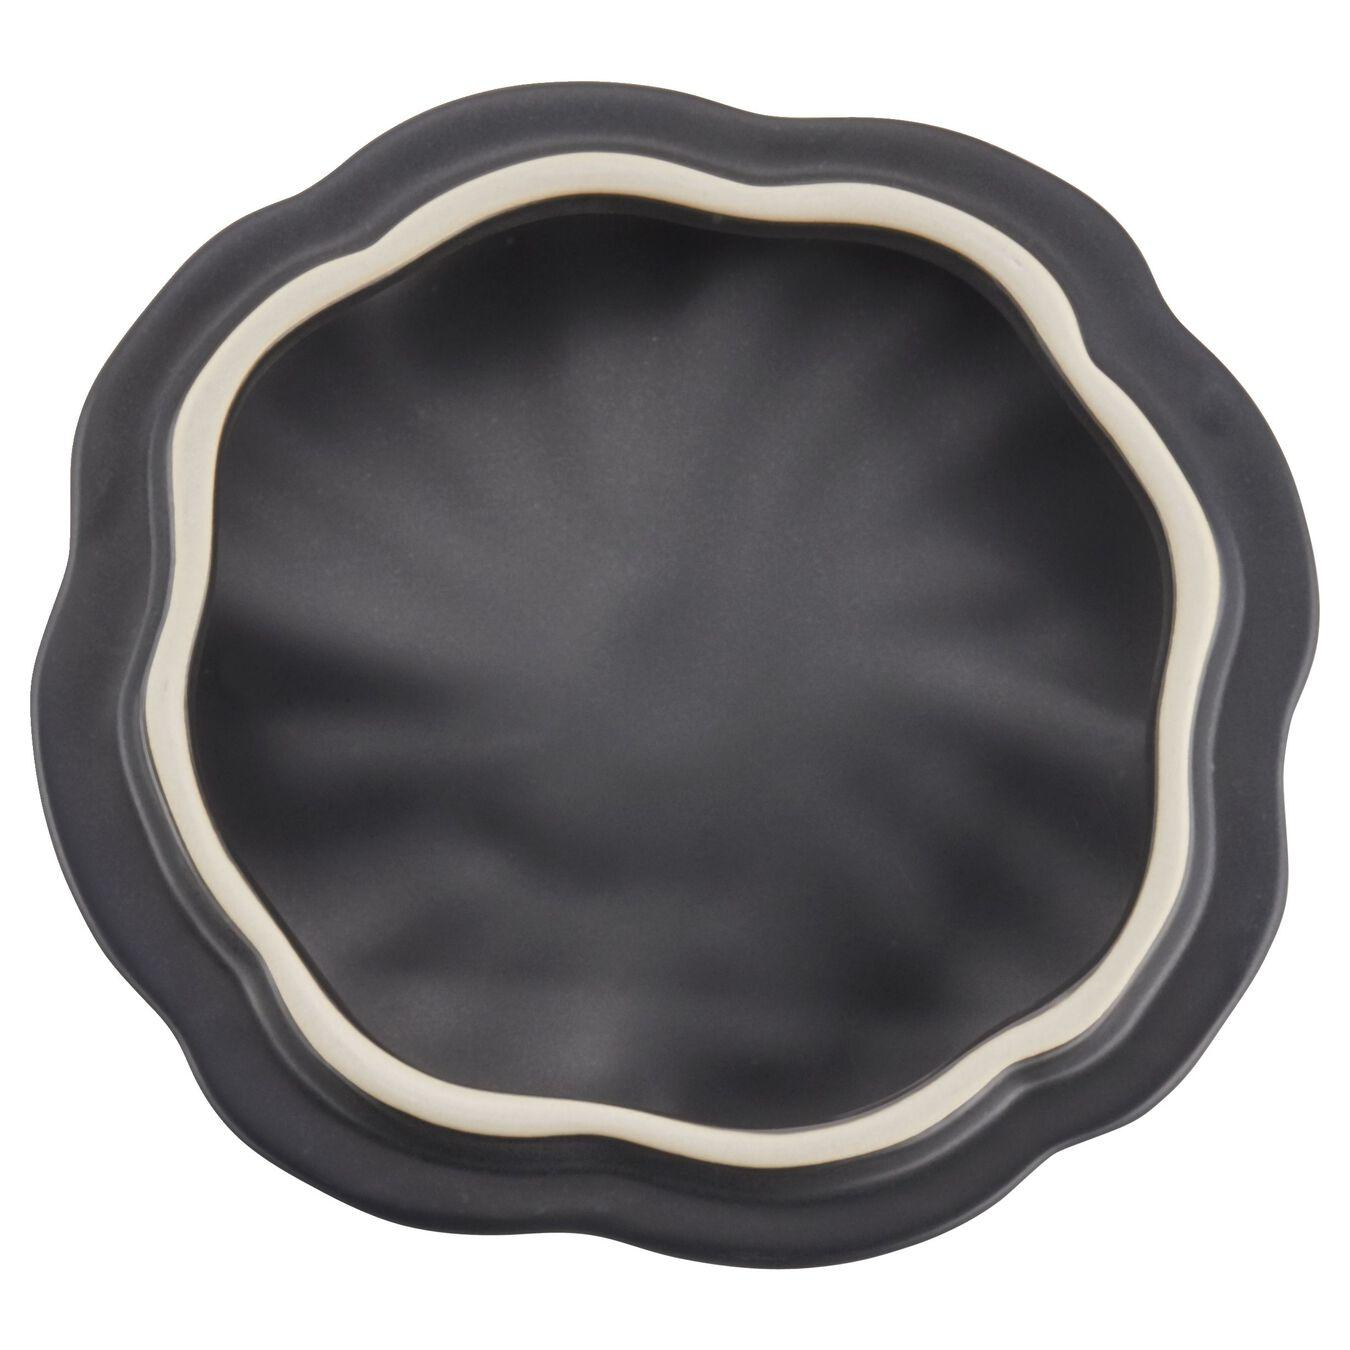 Cocotte zucca - 15 cm, Nera,,large 8